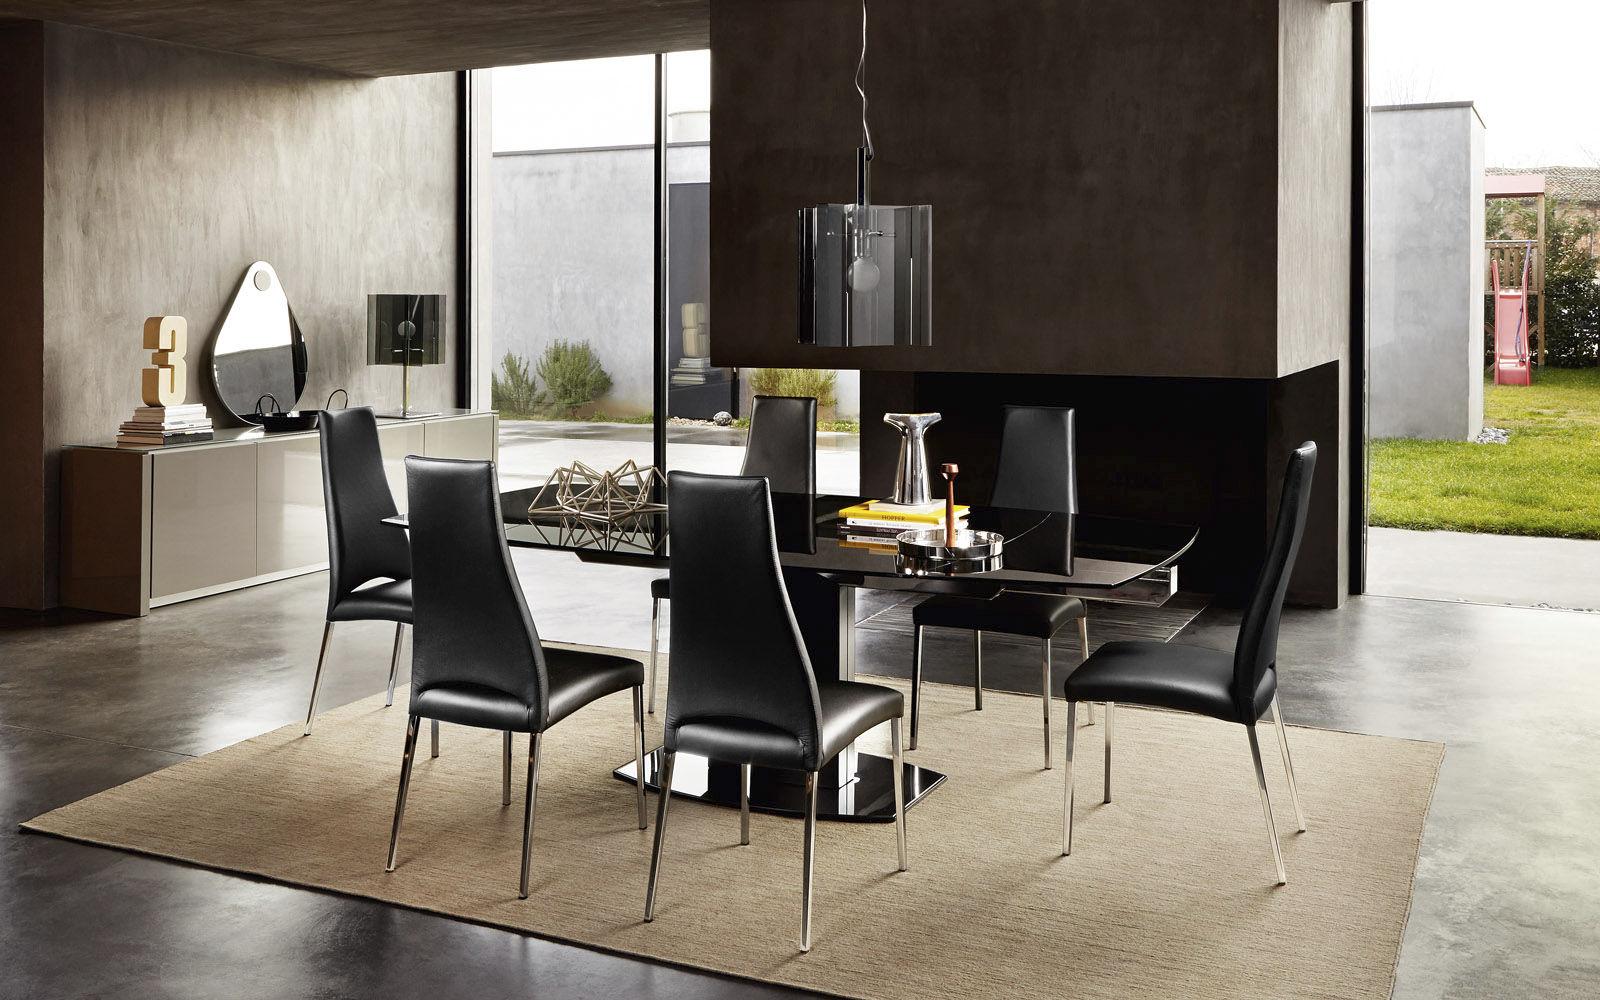 Sedia Imbottita Design : Sedia moderna imbottita con braccioli cantilever juliet by